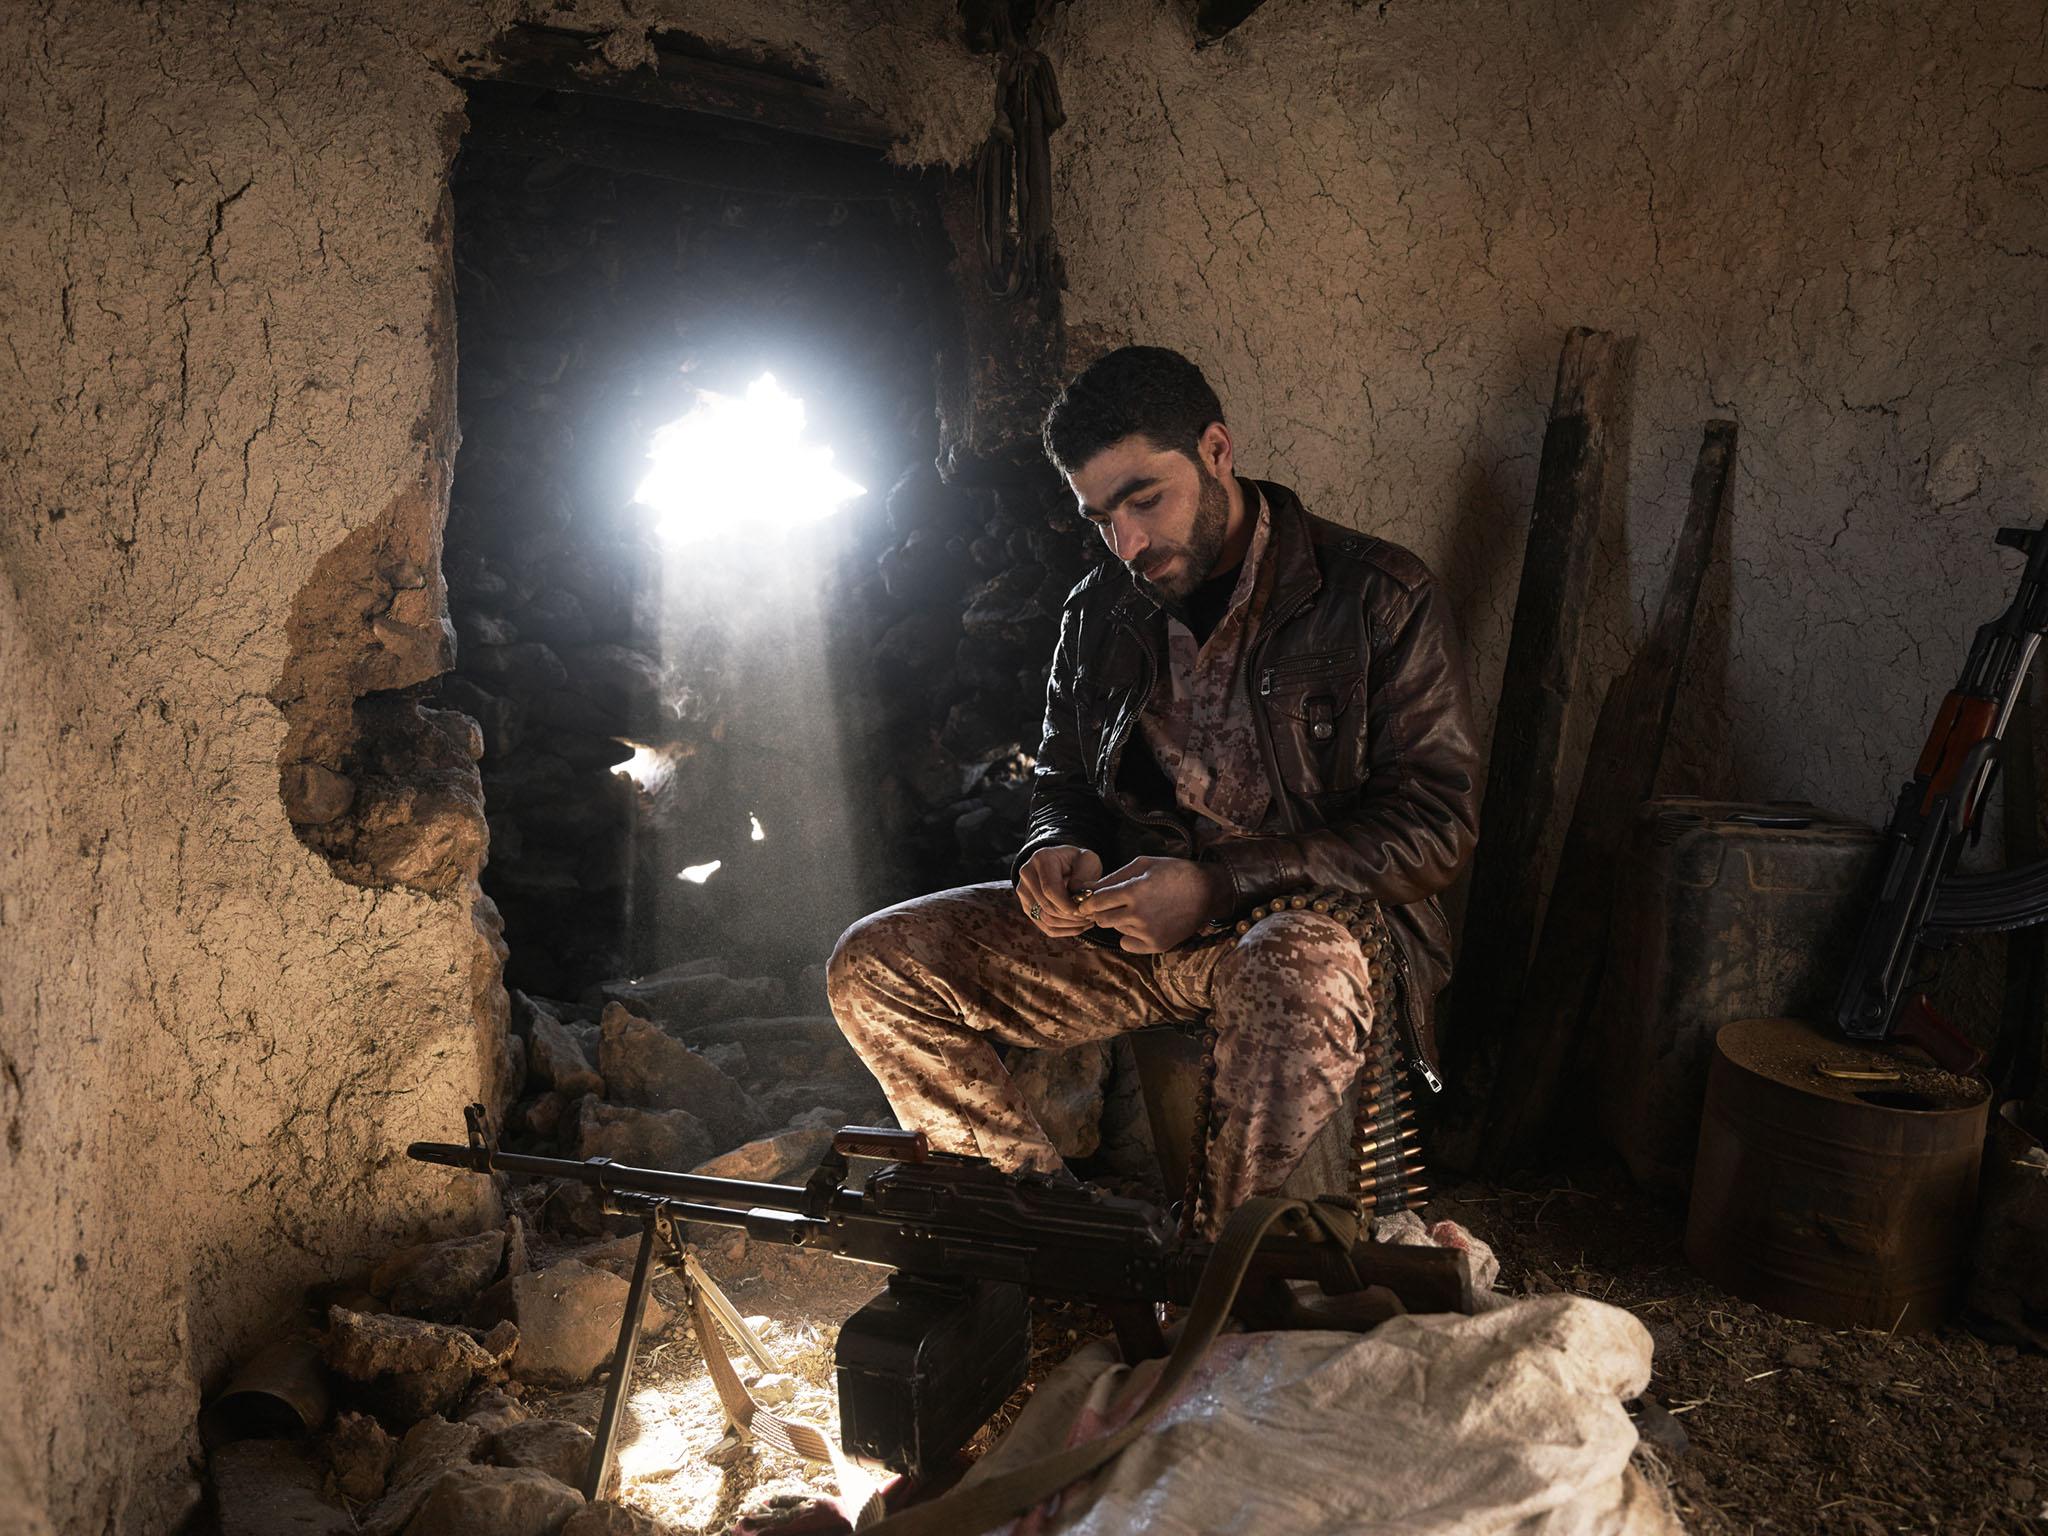 [Image: We-Came-From-Fire-Iraq-Syria-Kurdistan-Joey-L-017.jpg]